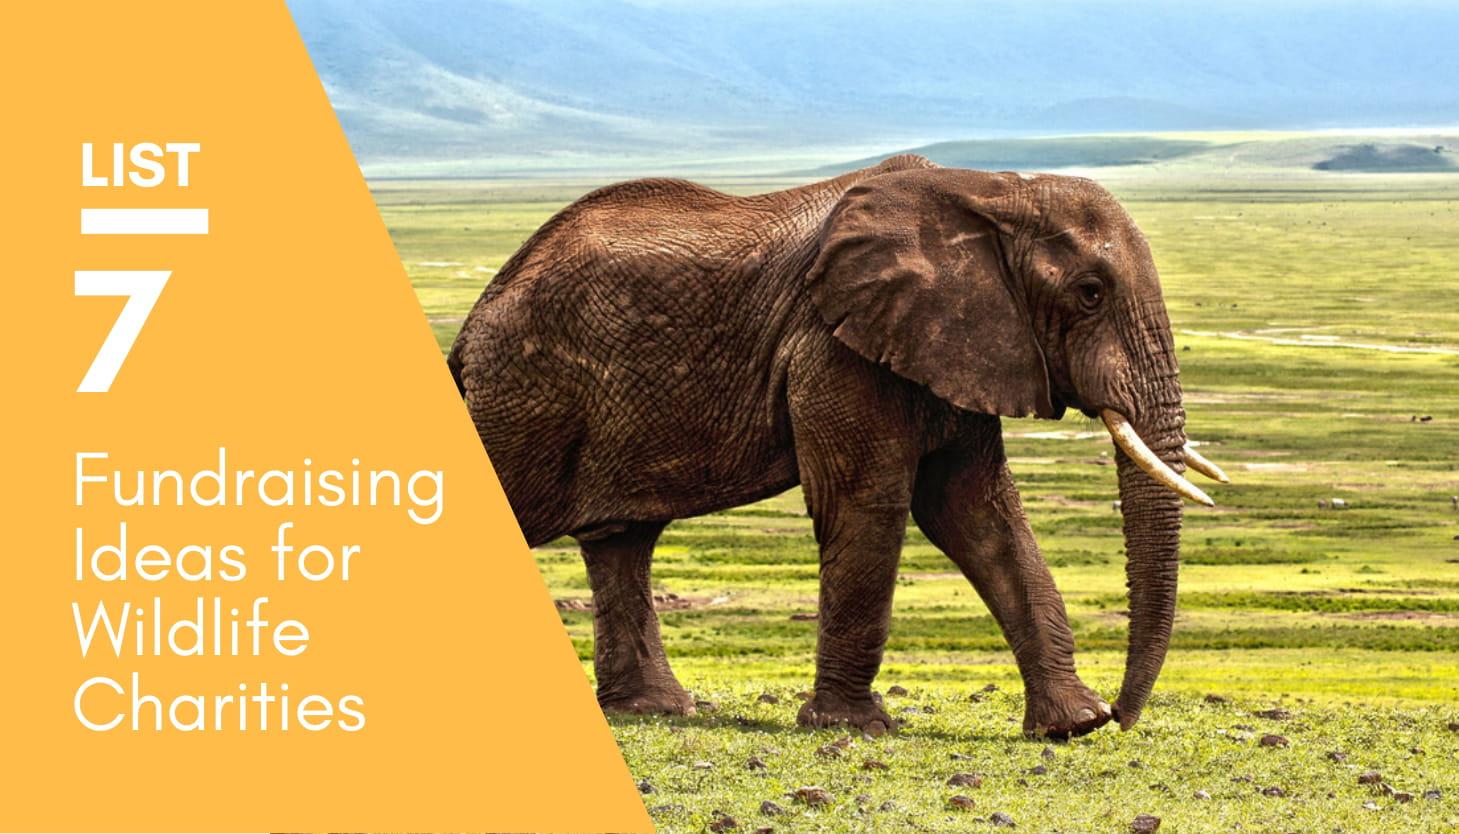 7 Fundraising Ideas For Wildlife Charities That Raise Awareness